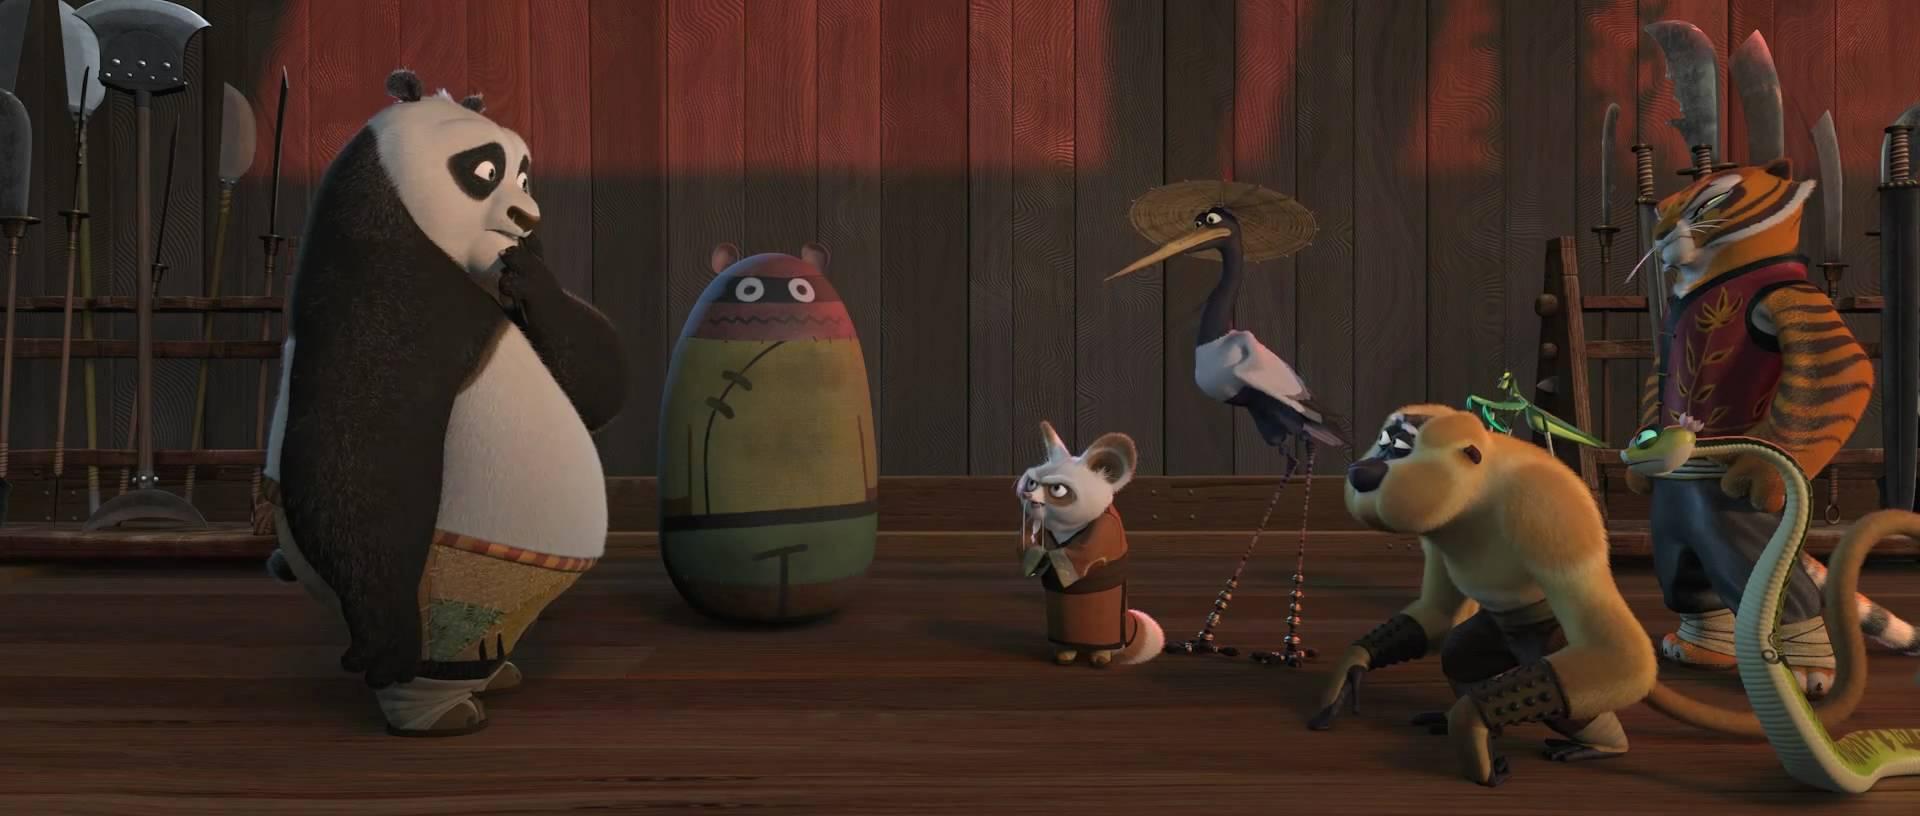 Kung Fu Panda | Official Trailer